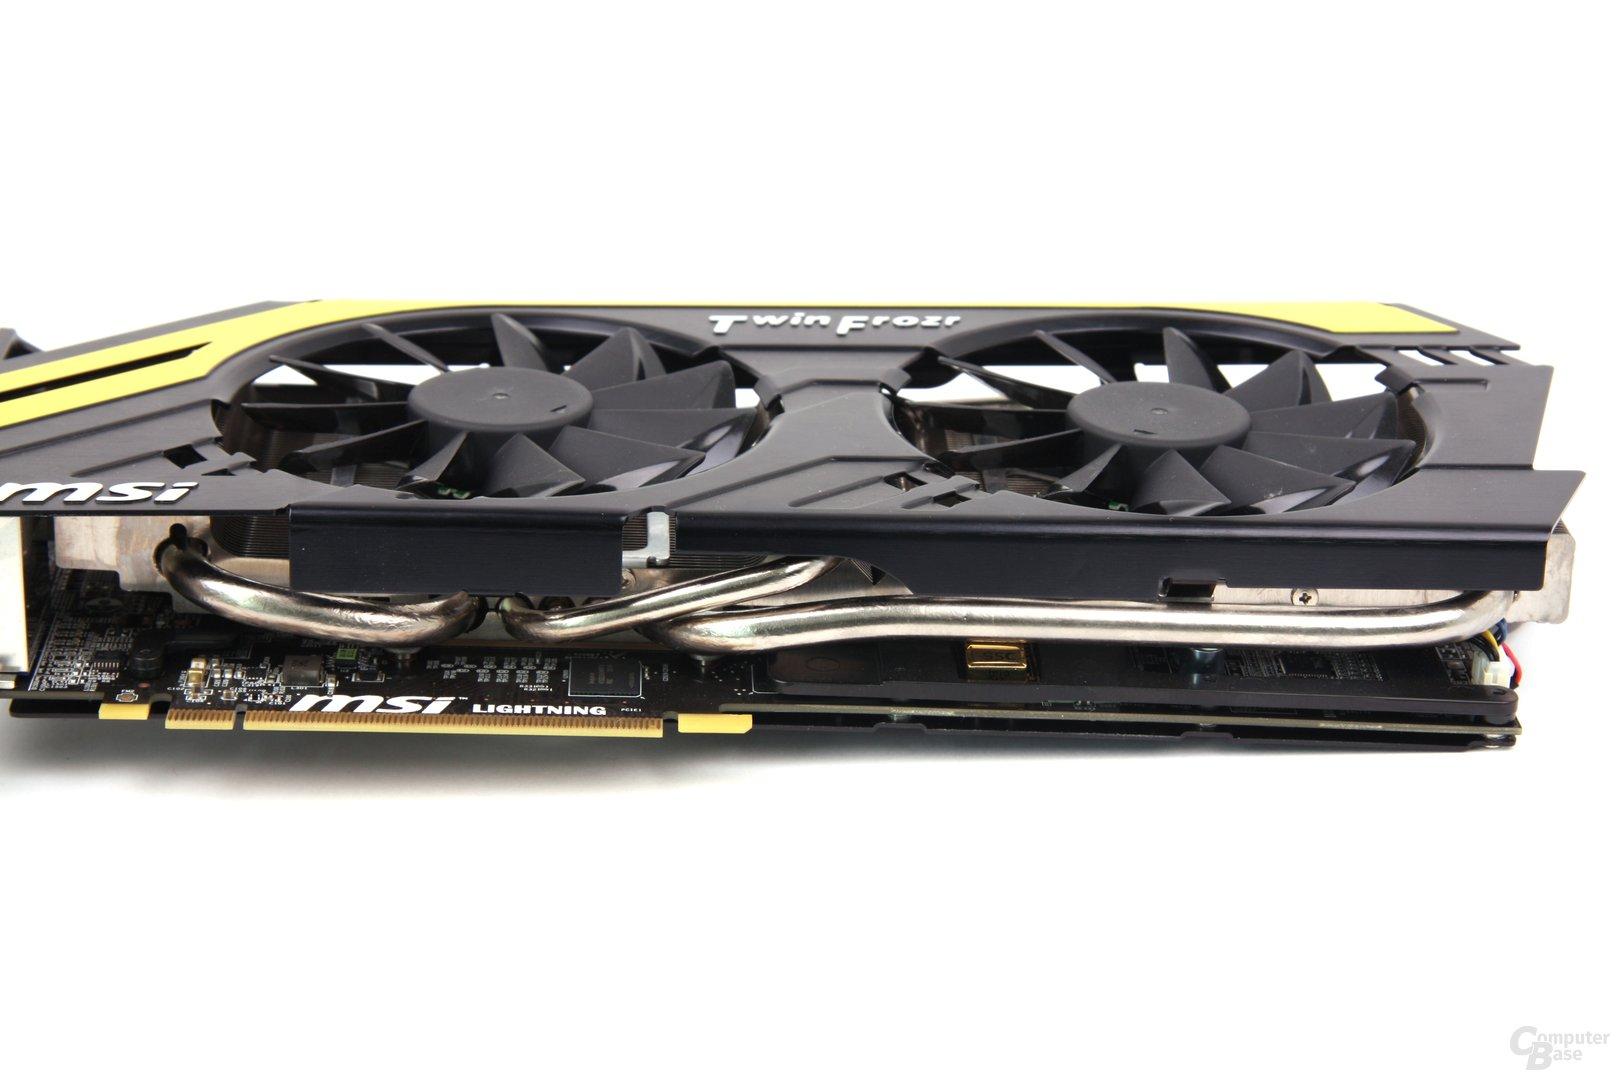 Radeon HD 7970 Lightning Heatpipes